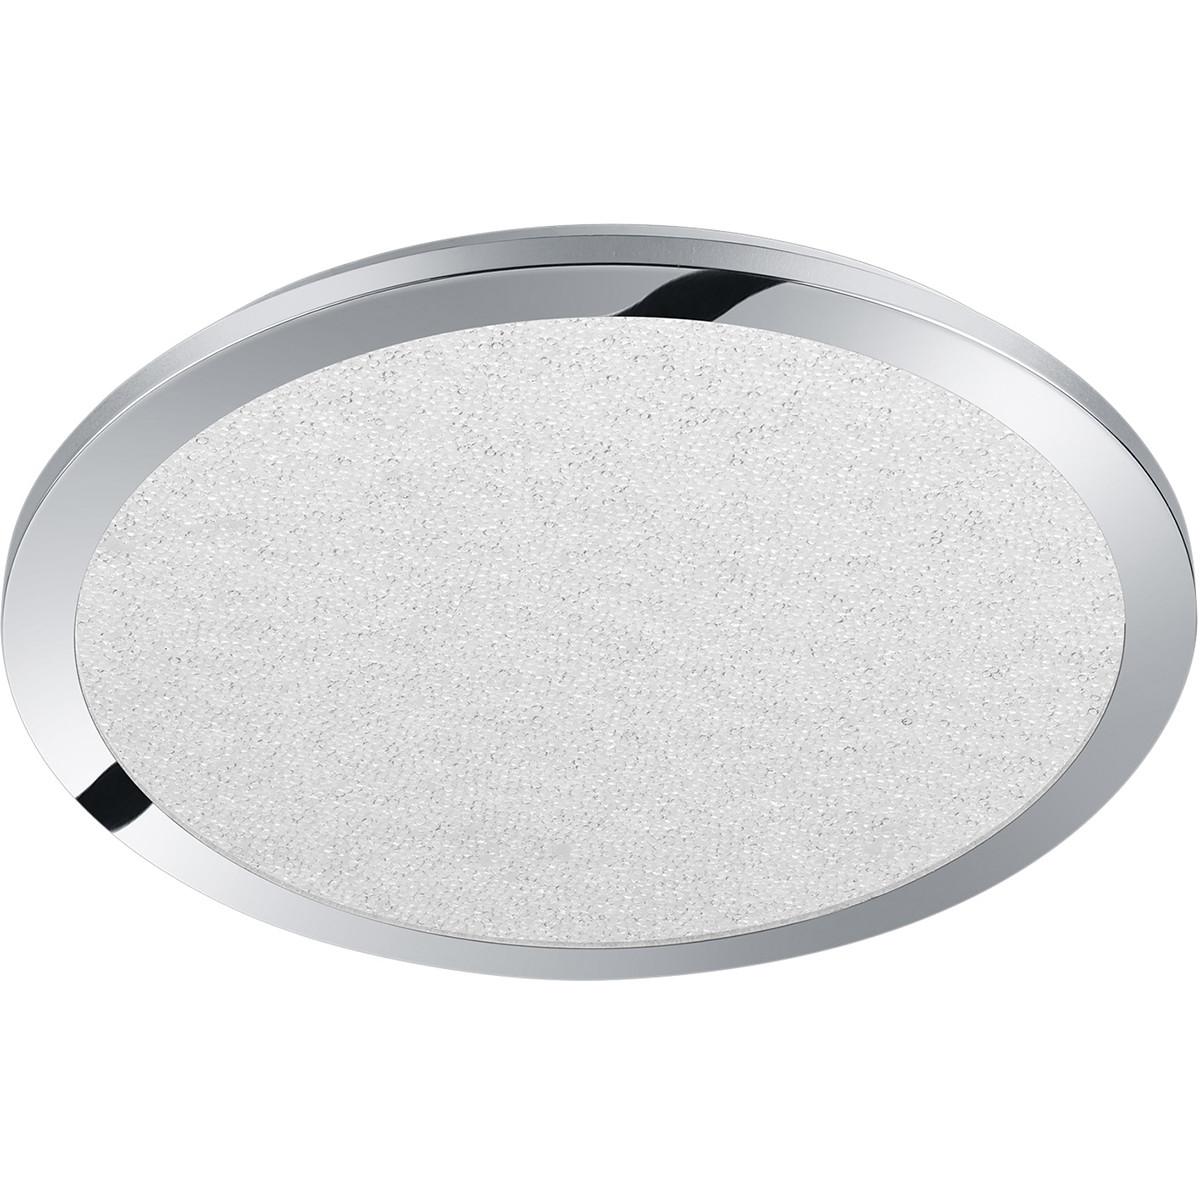 LED Plafondlamp - Trion Ceaniry - Opbouw Rond 24W - Spatwaterdicht IP44 - Dimbaar - Warm Wit 3000K -